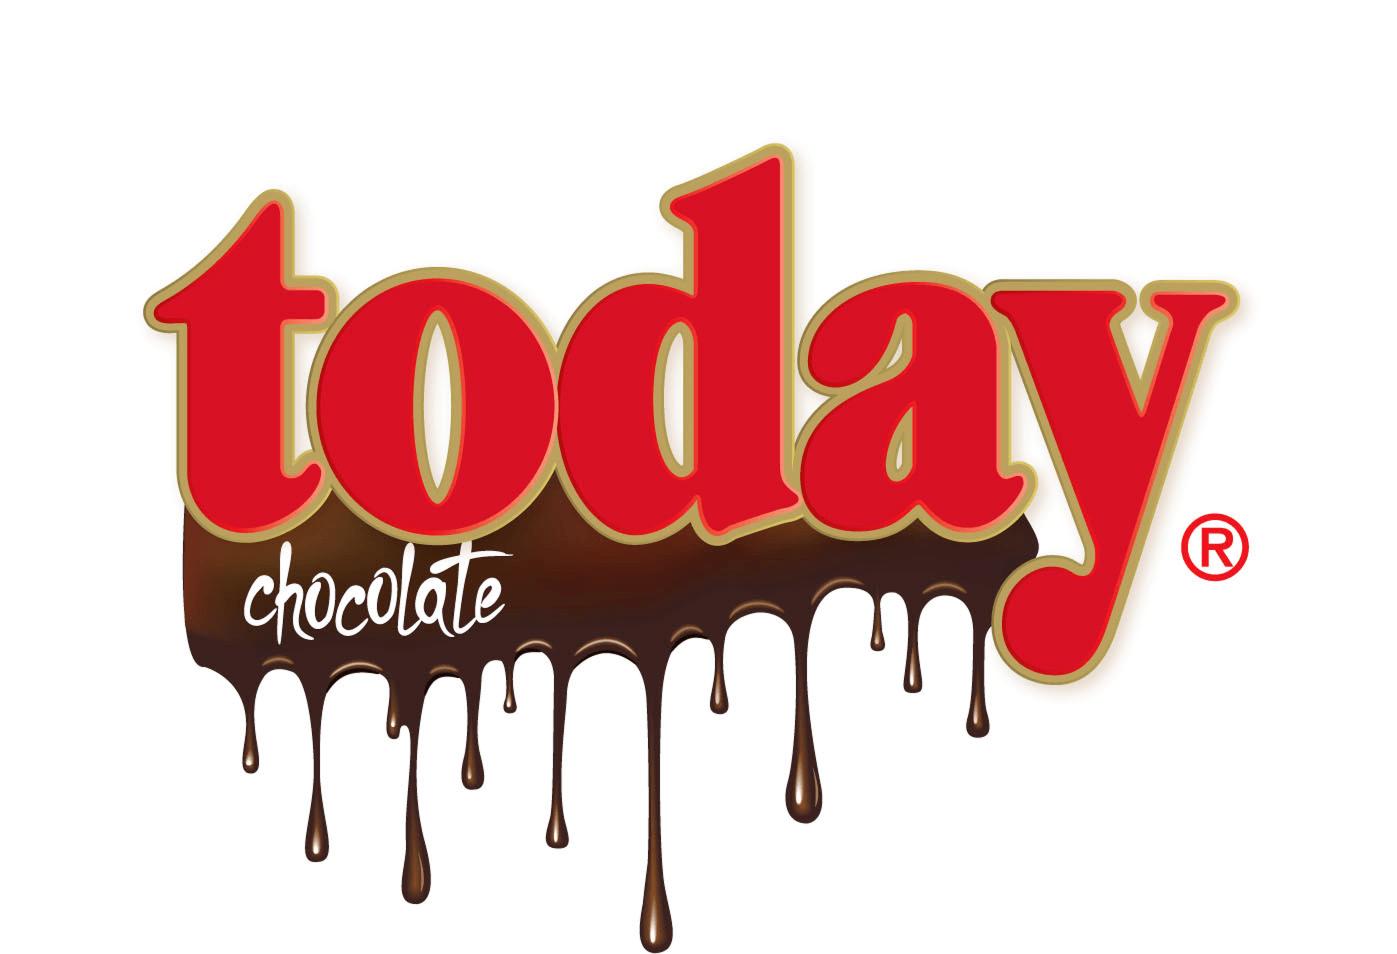 Philadelphia Chocolate Manufacturing Co.